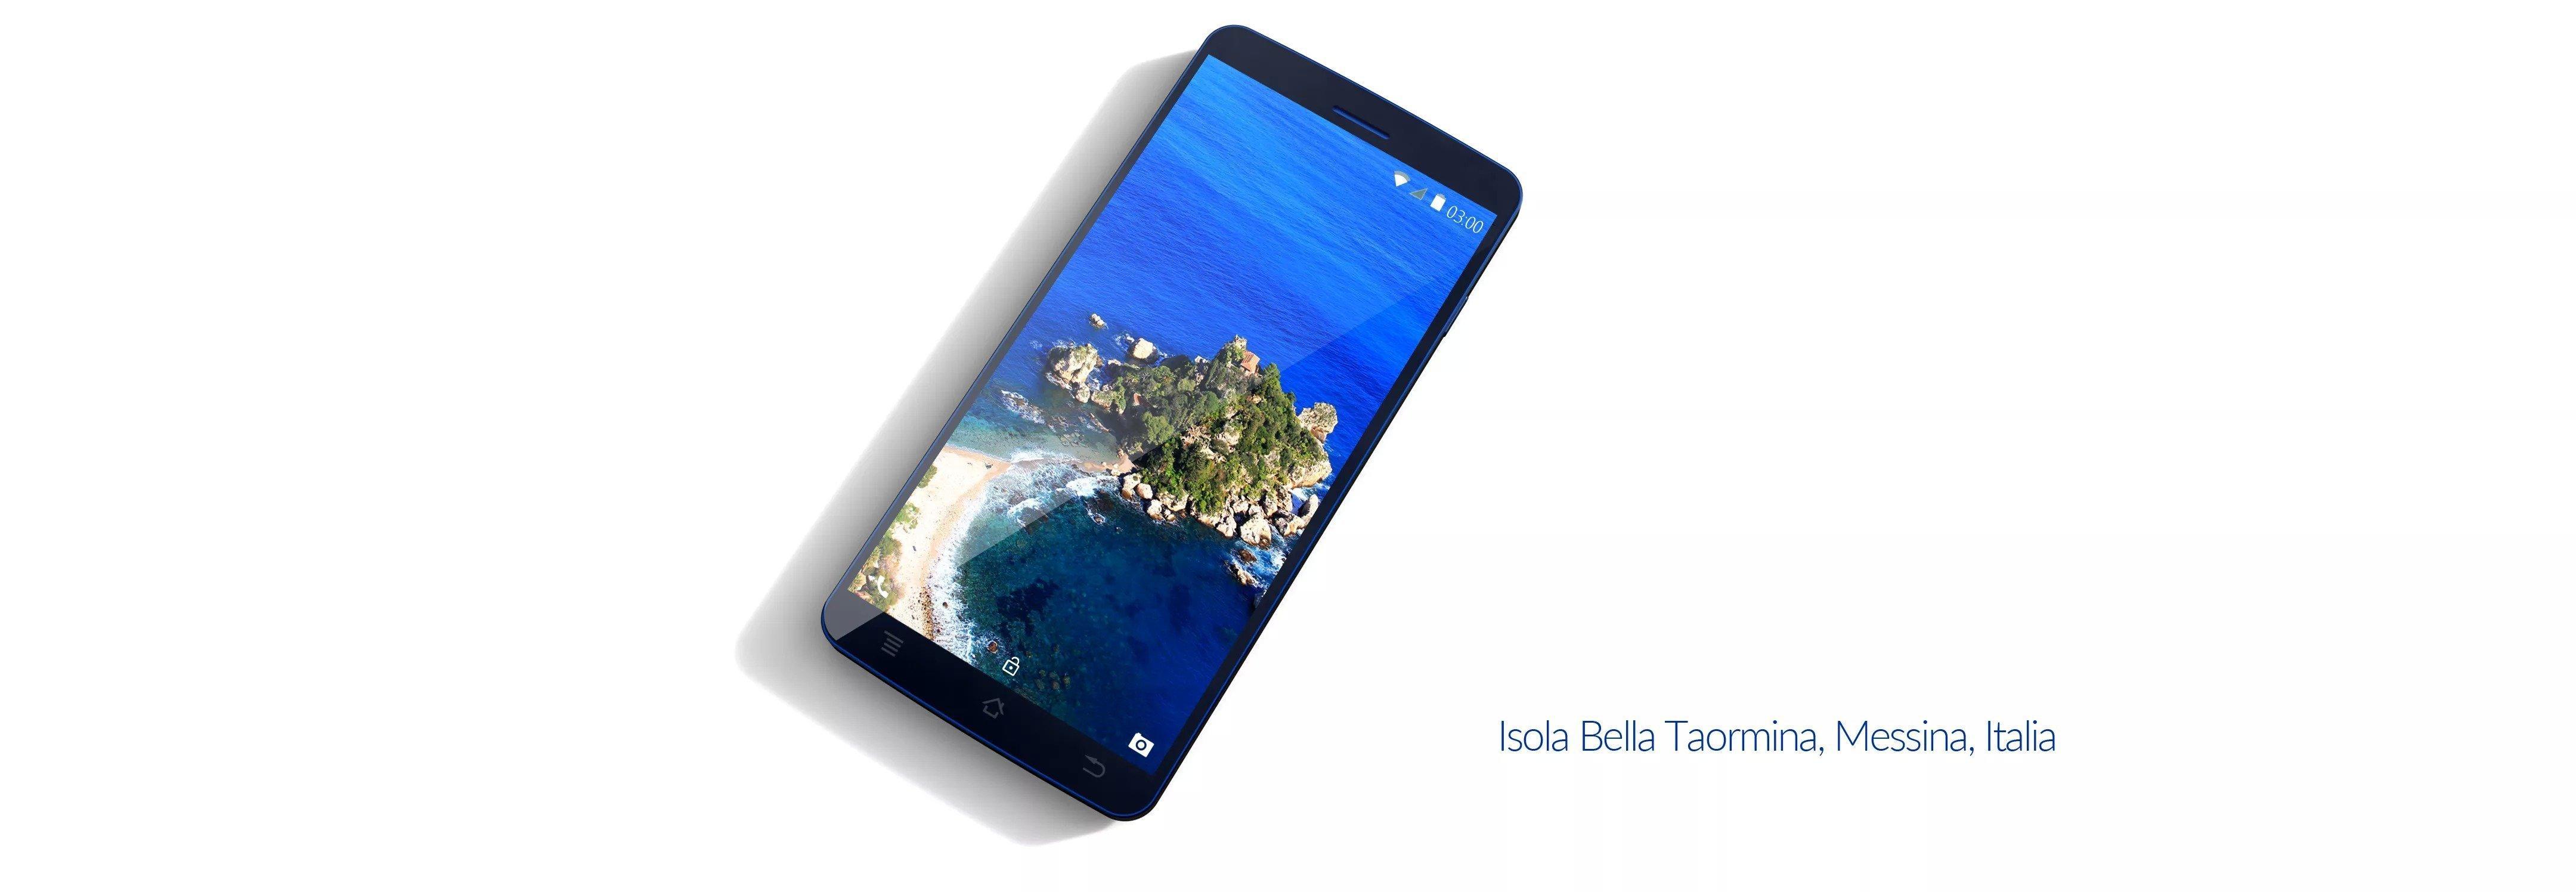 Stonex One: lo smartphone italiano